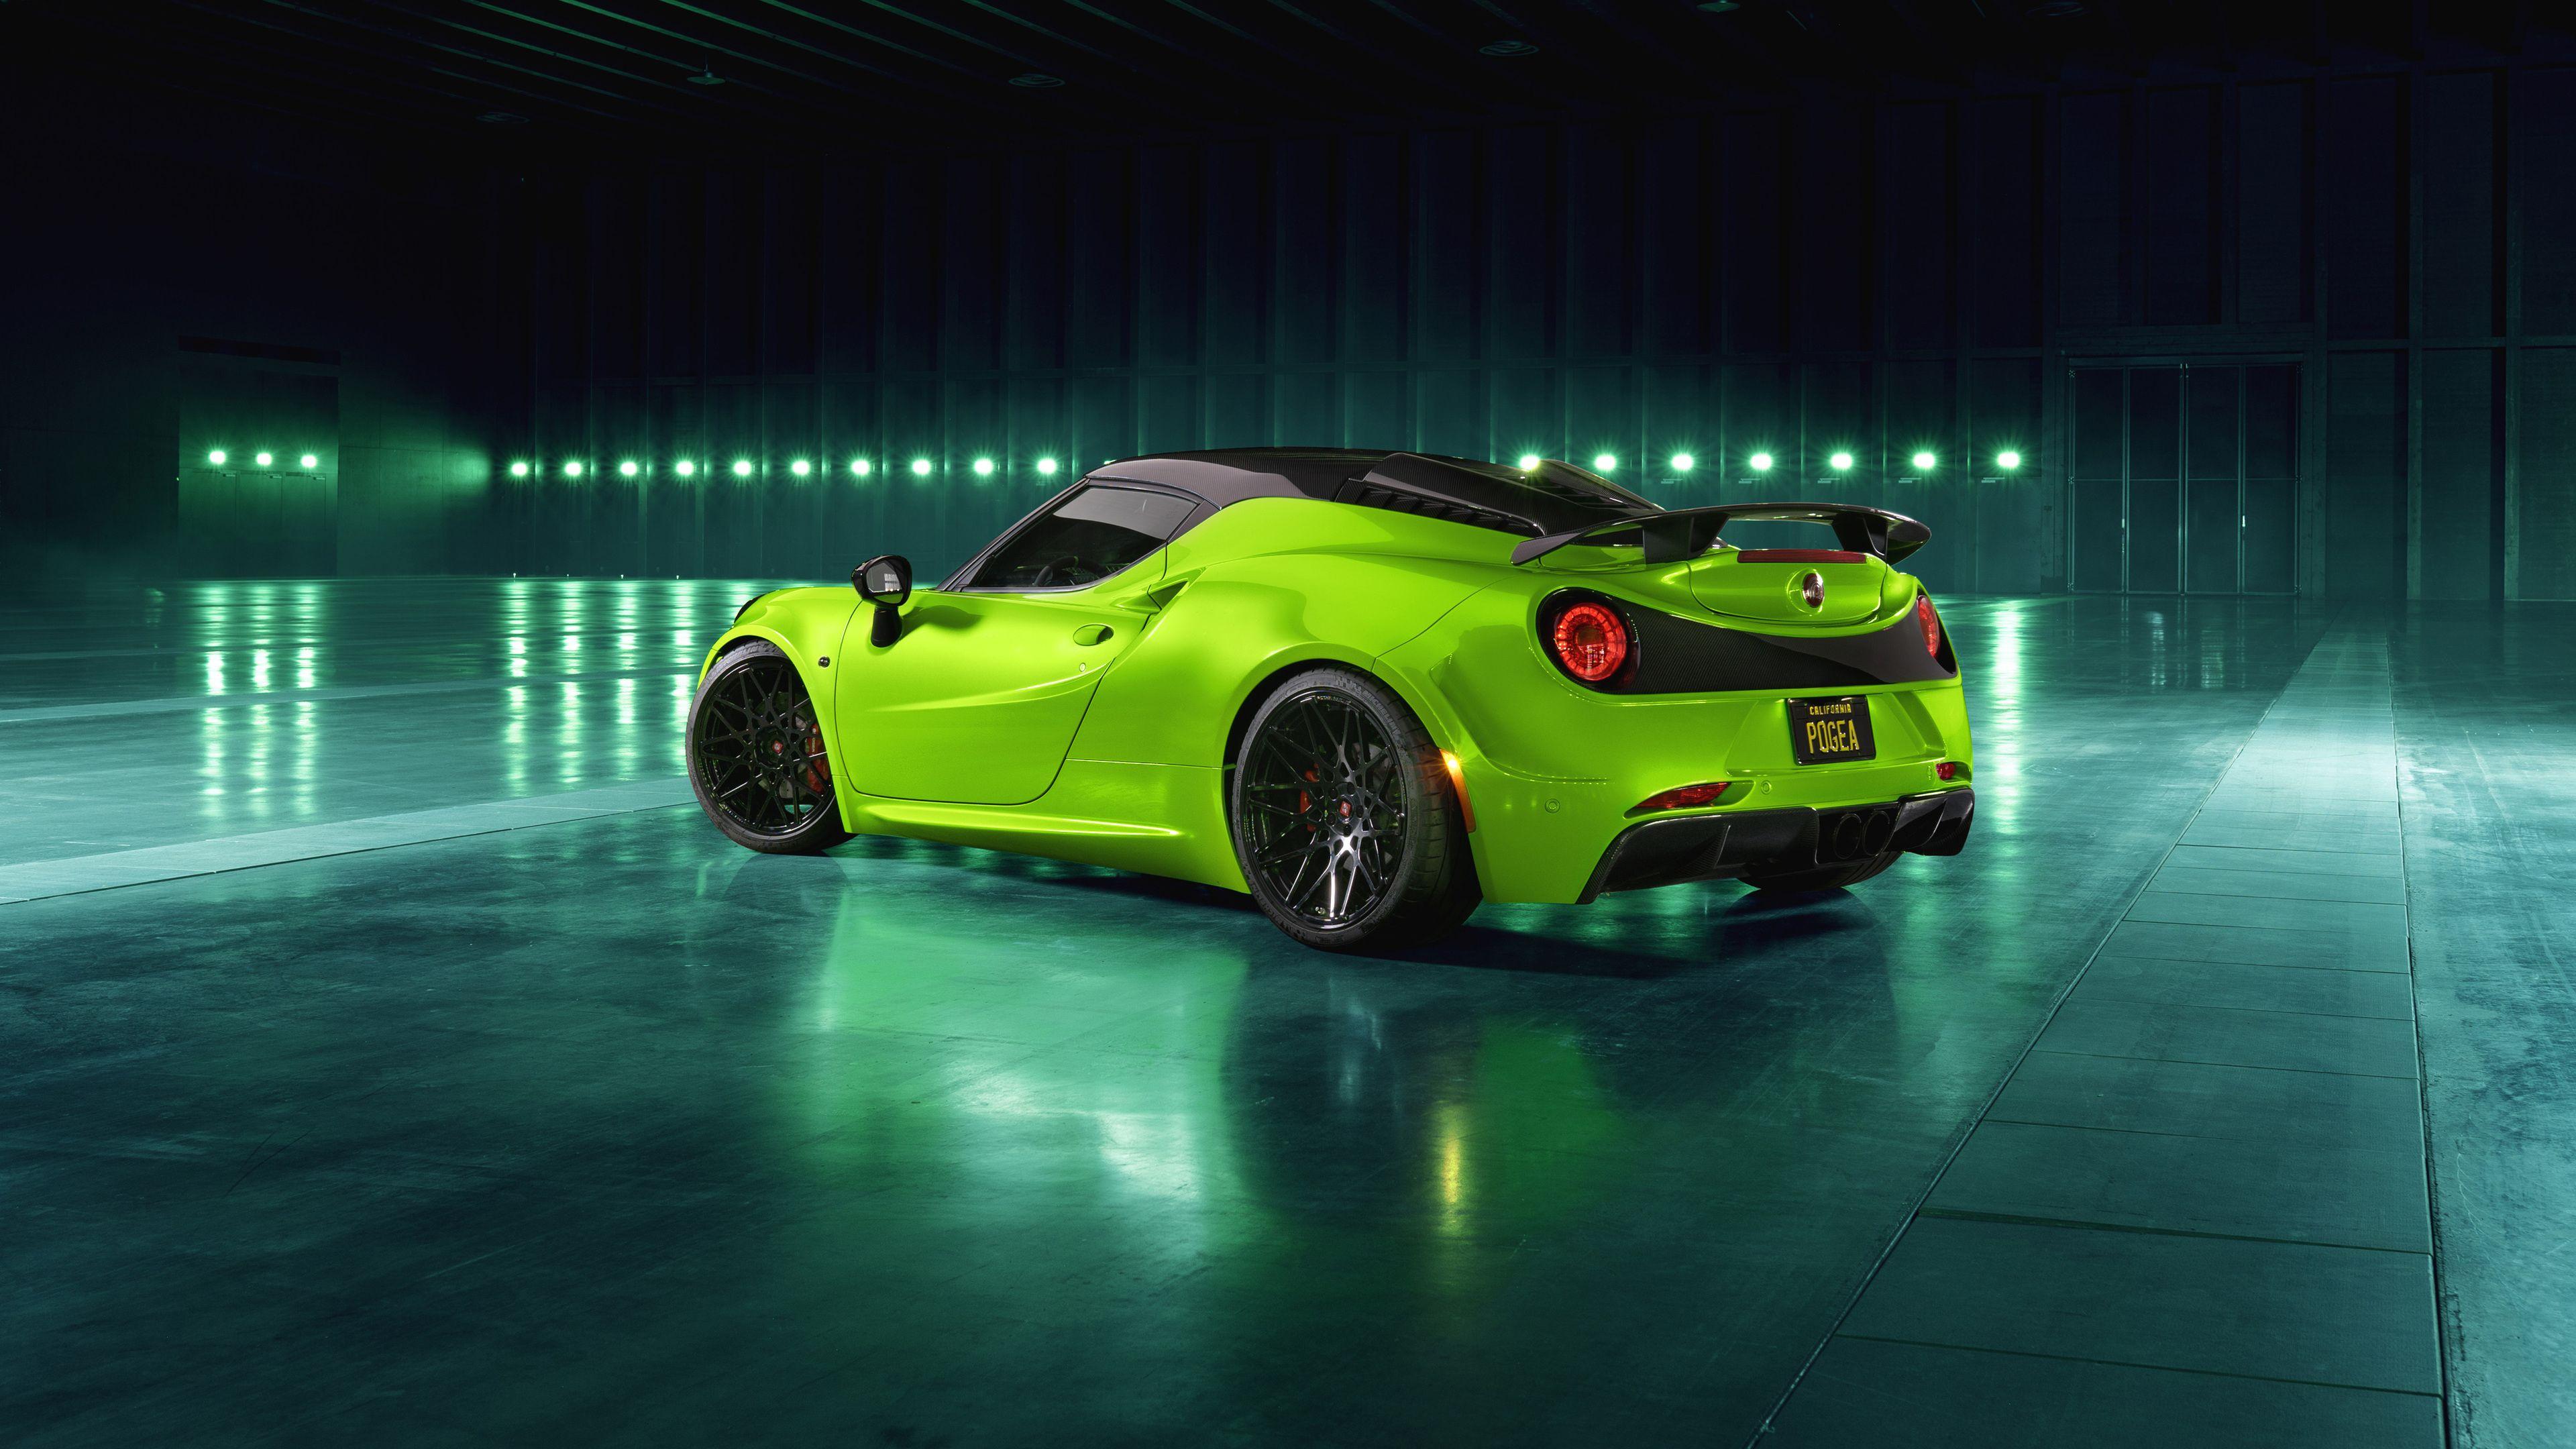 Wallpaper 4k Pogea Racing Centurion Green Arrow 2018 Rear View